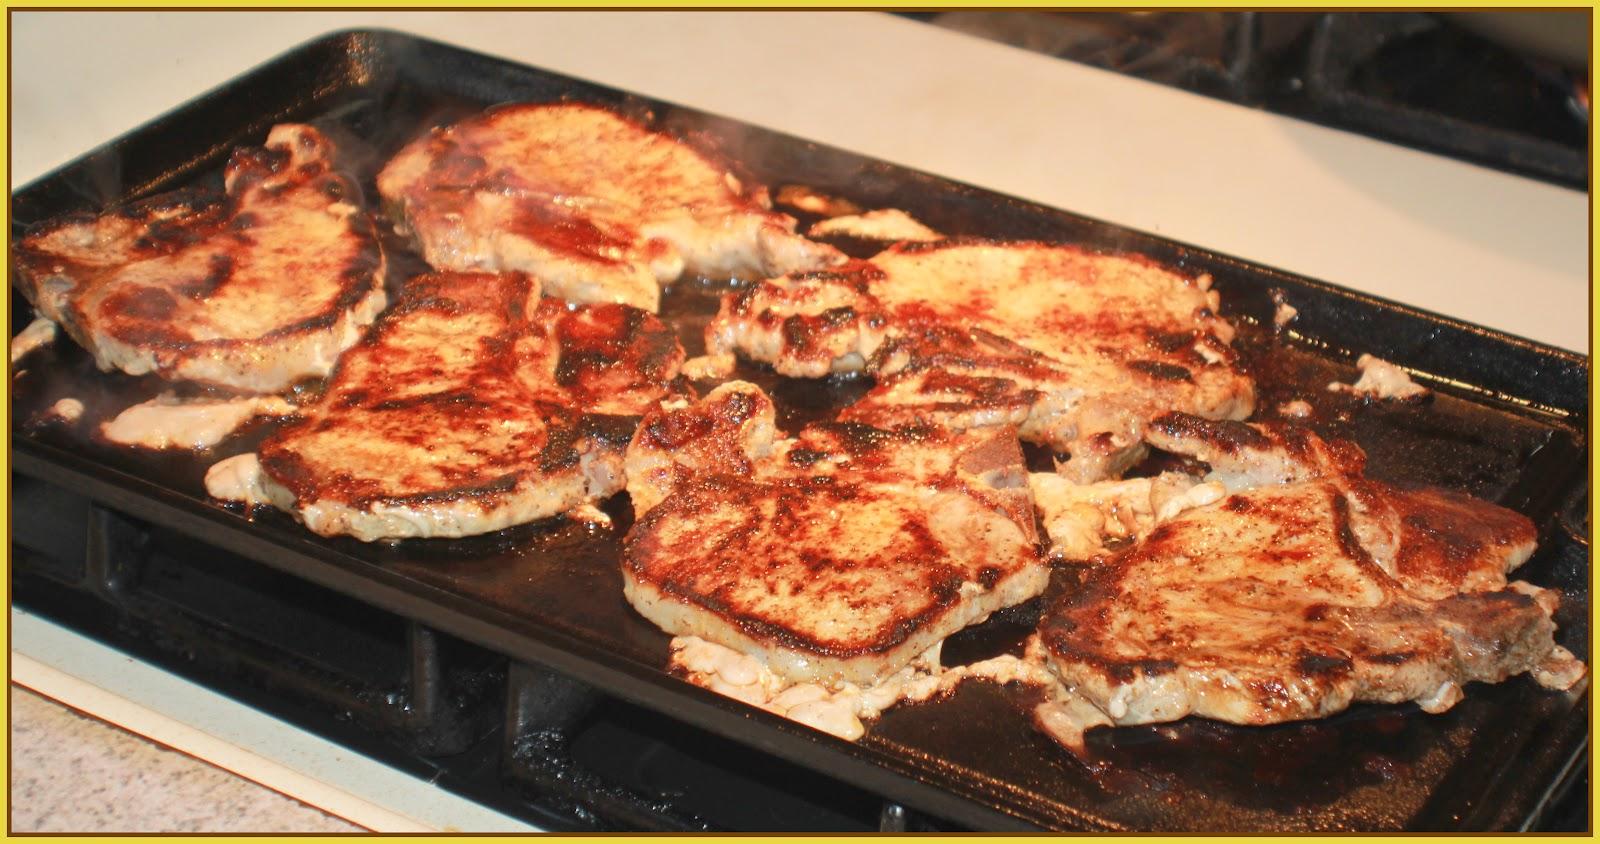 Desayuno para el Lunes-http://4.bp.blogspot.com/-LchO0klE4So/UEAsVLgvUWI/AAAAAAAADd8/zlIVHWmNDIs/s1600/IMG_5277.JPG